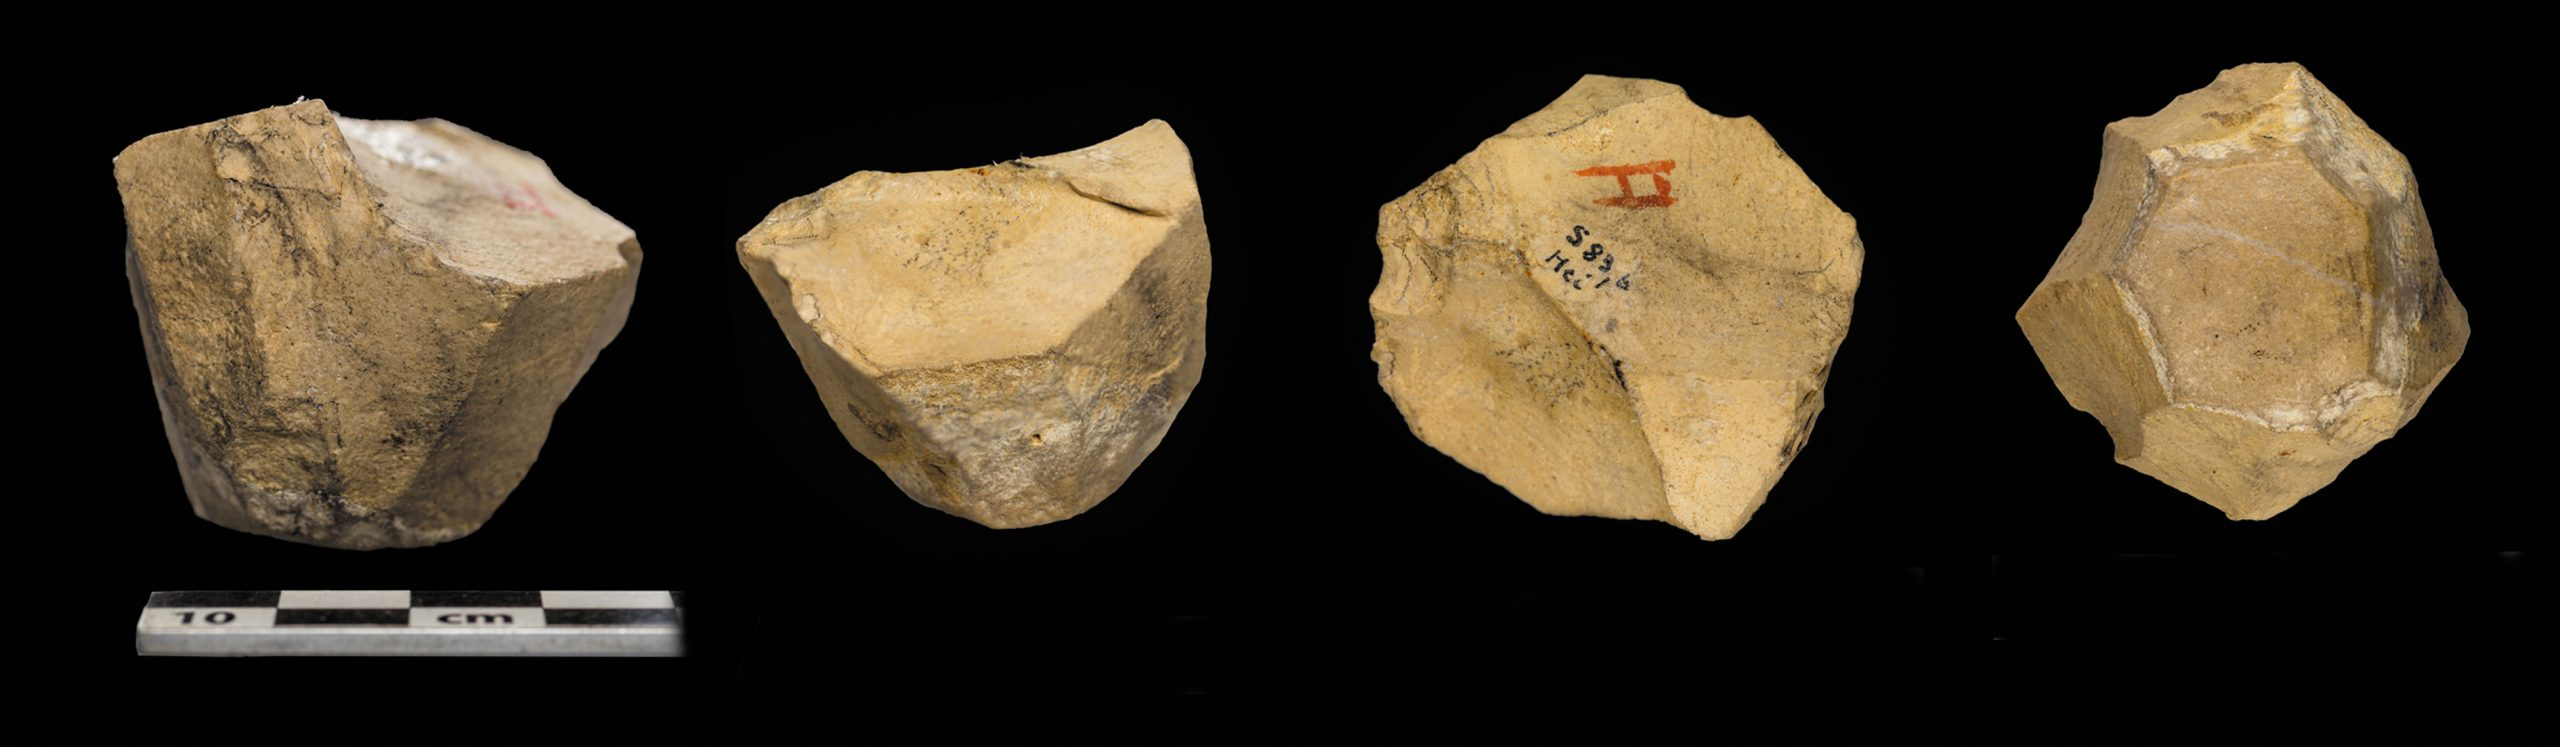 Pyramidal frustum-shaped core